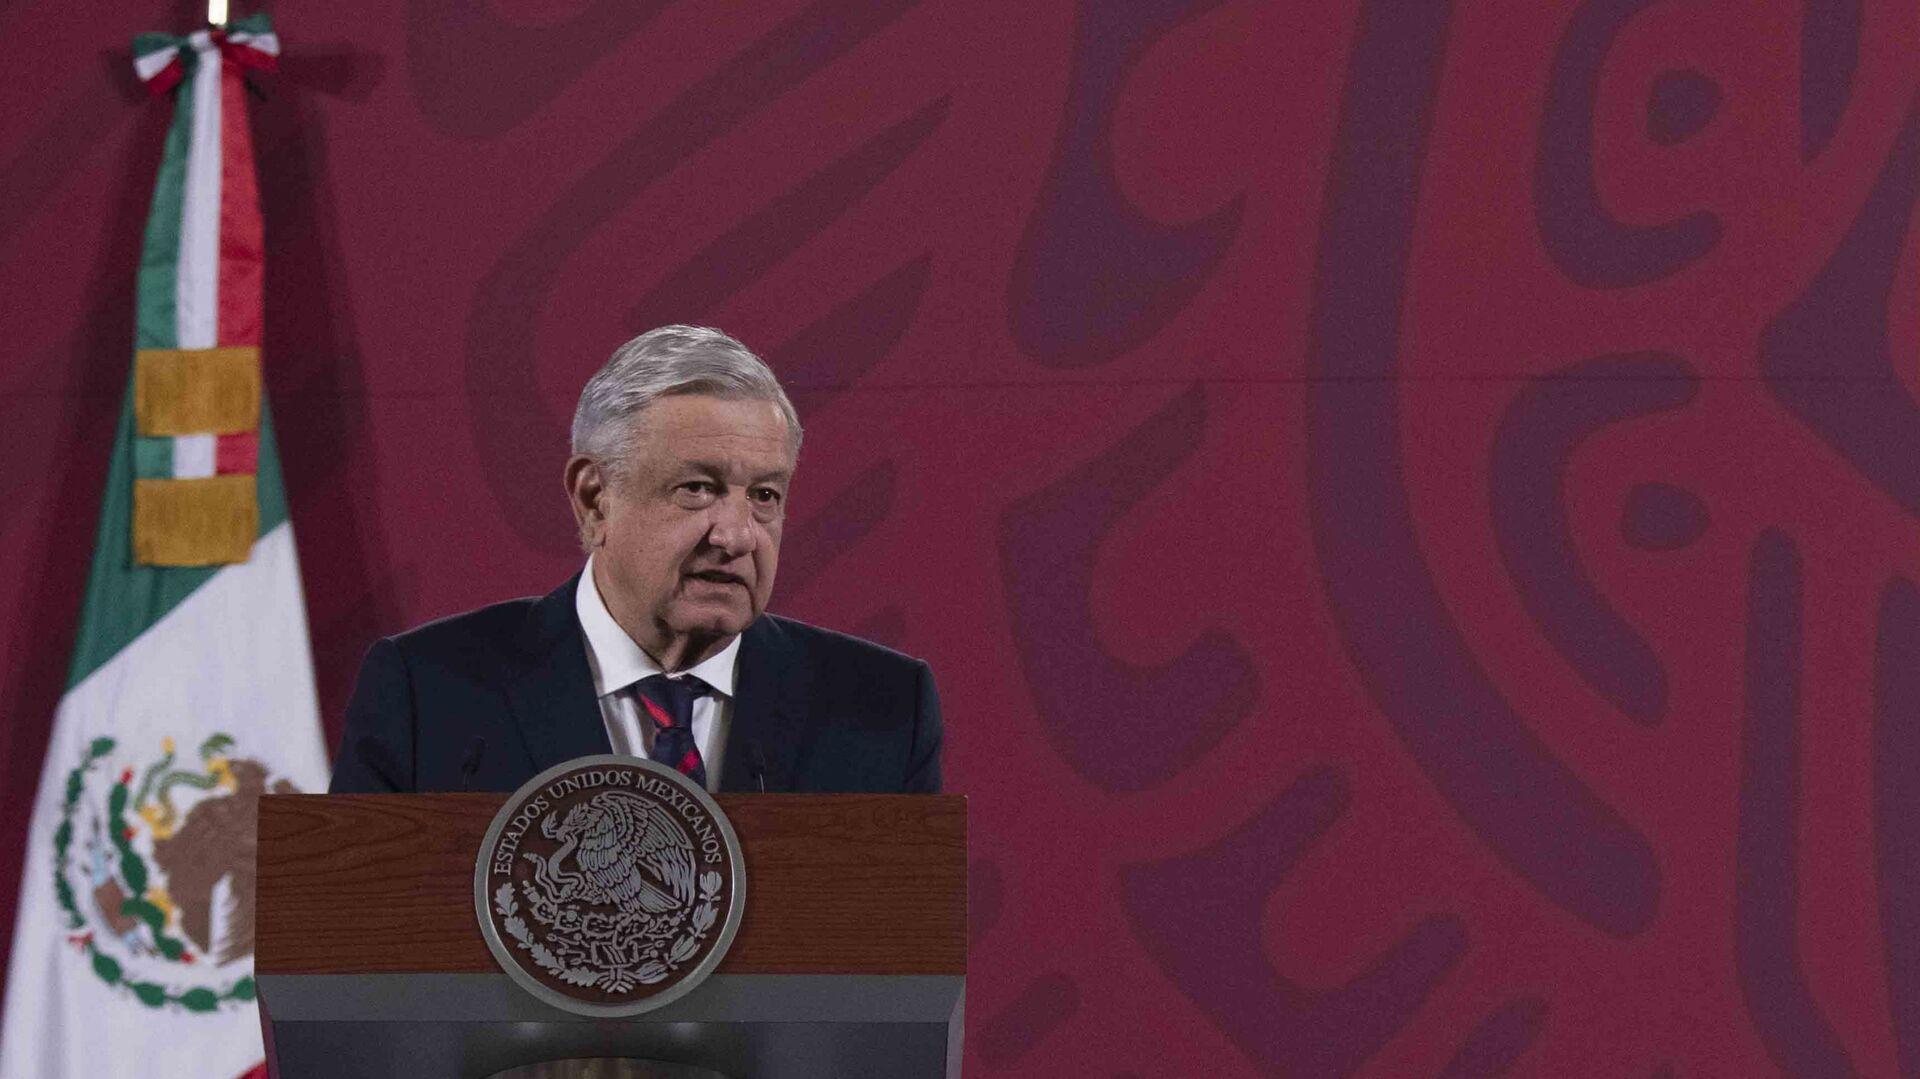 El presidente de México, Andrés Manuel López Obrador - Sputnik Mundo, 1920, 06.04.2021